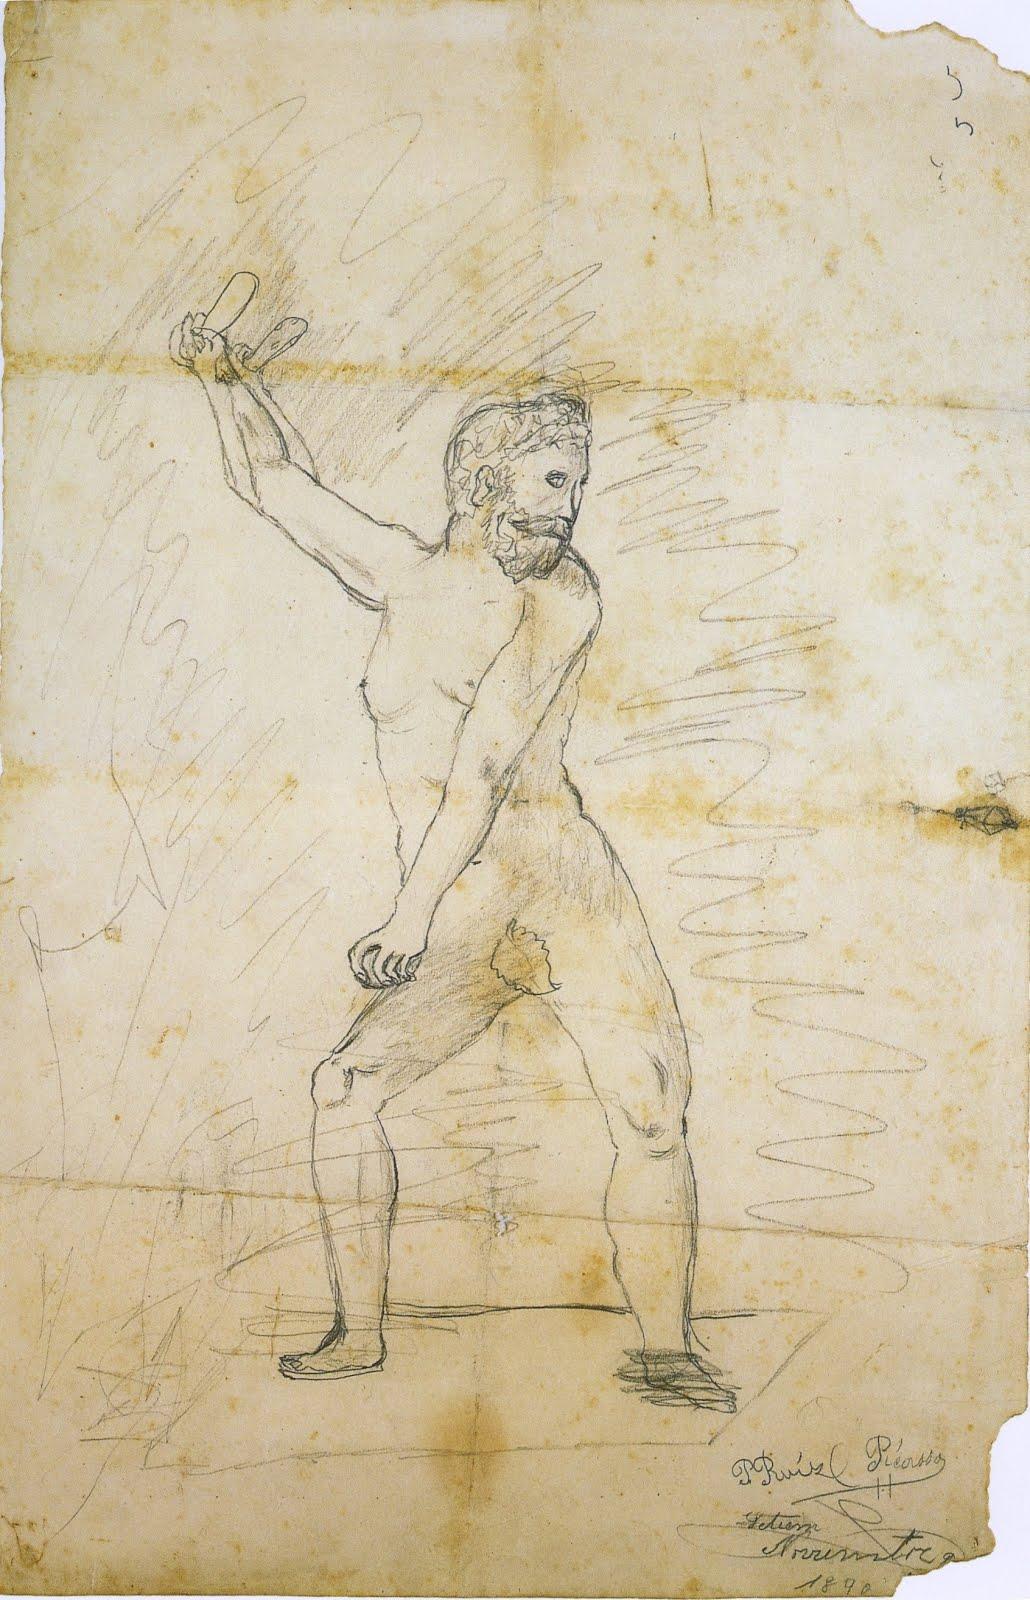 pablo picasso sketches - photo #11